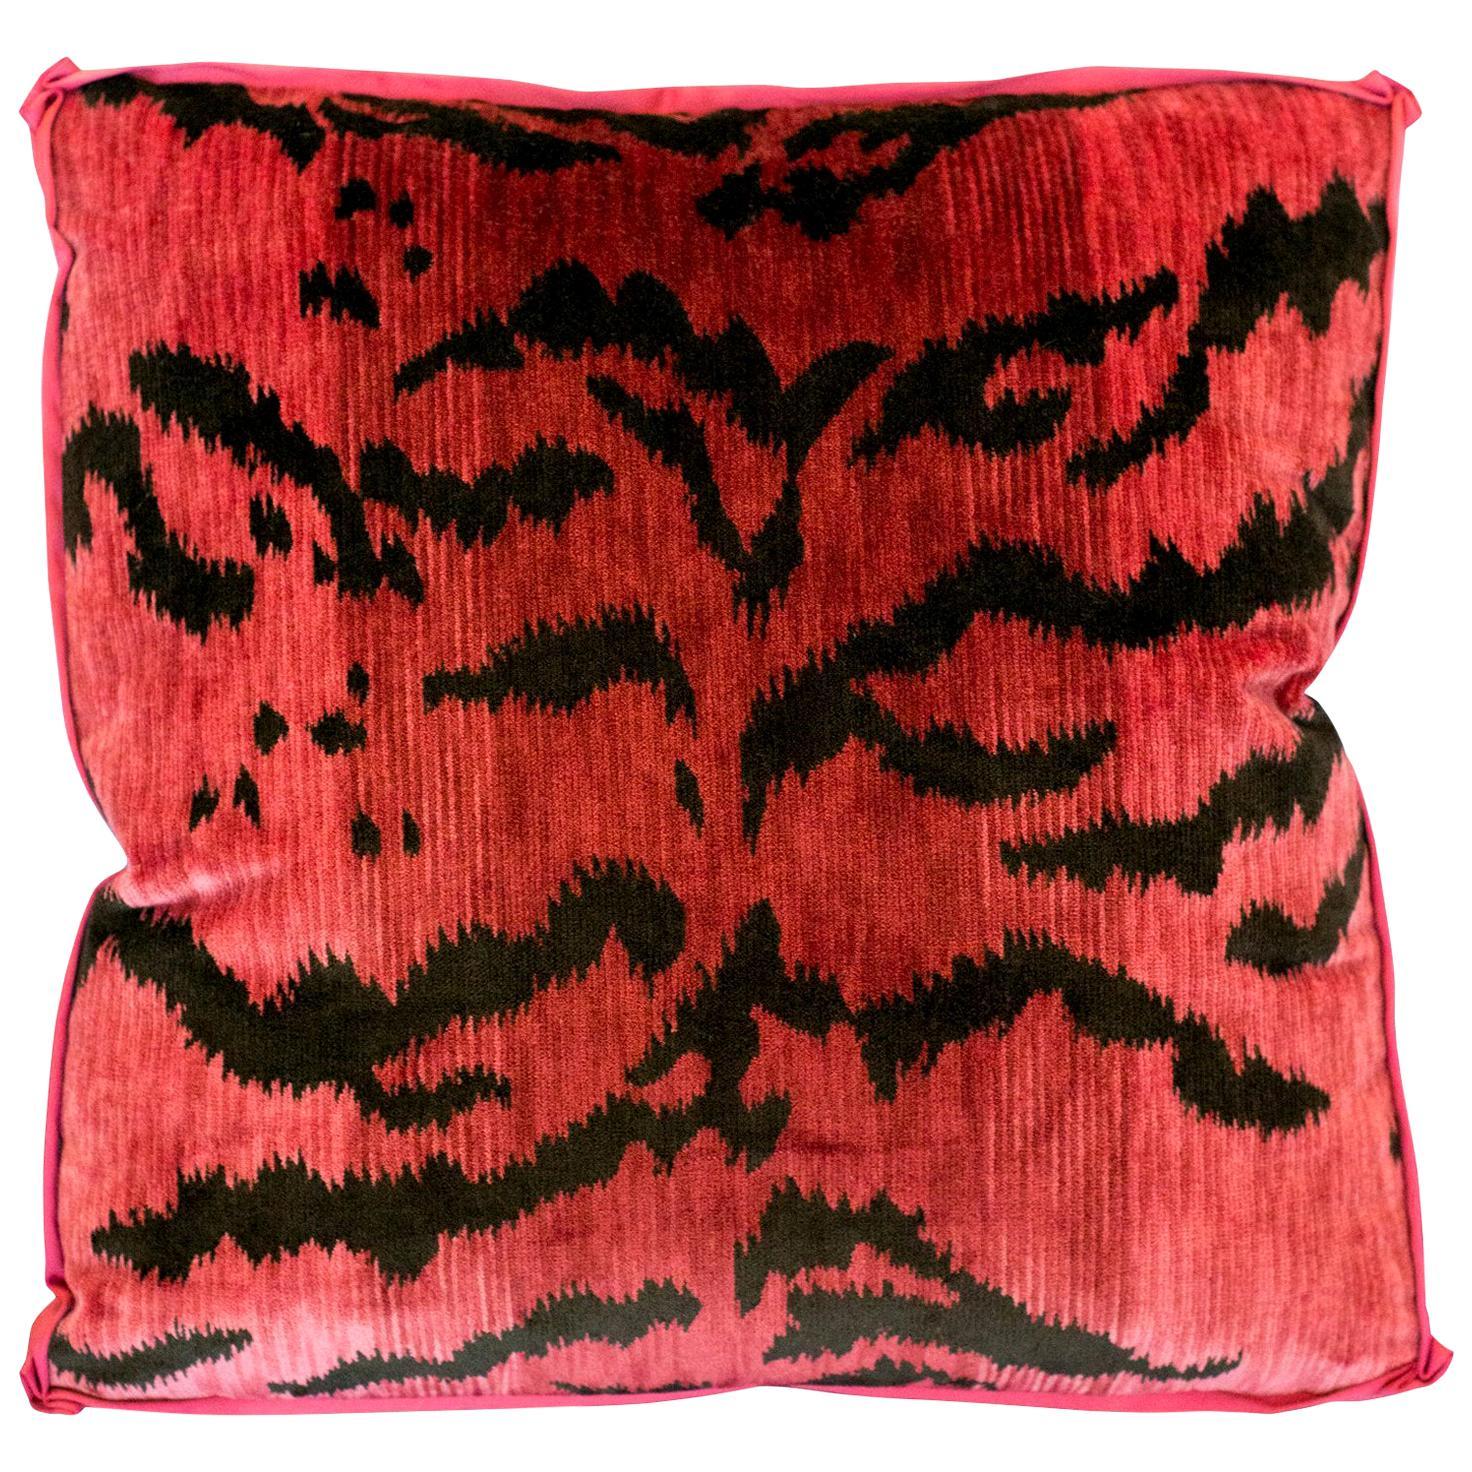 Pink Bevilacqua Tiger Silk Velvet and Satin Pillow by Studio Maison Nurita